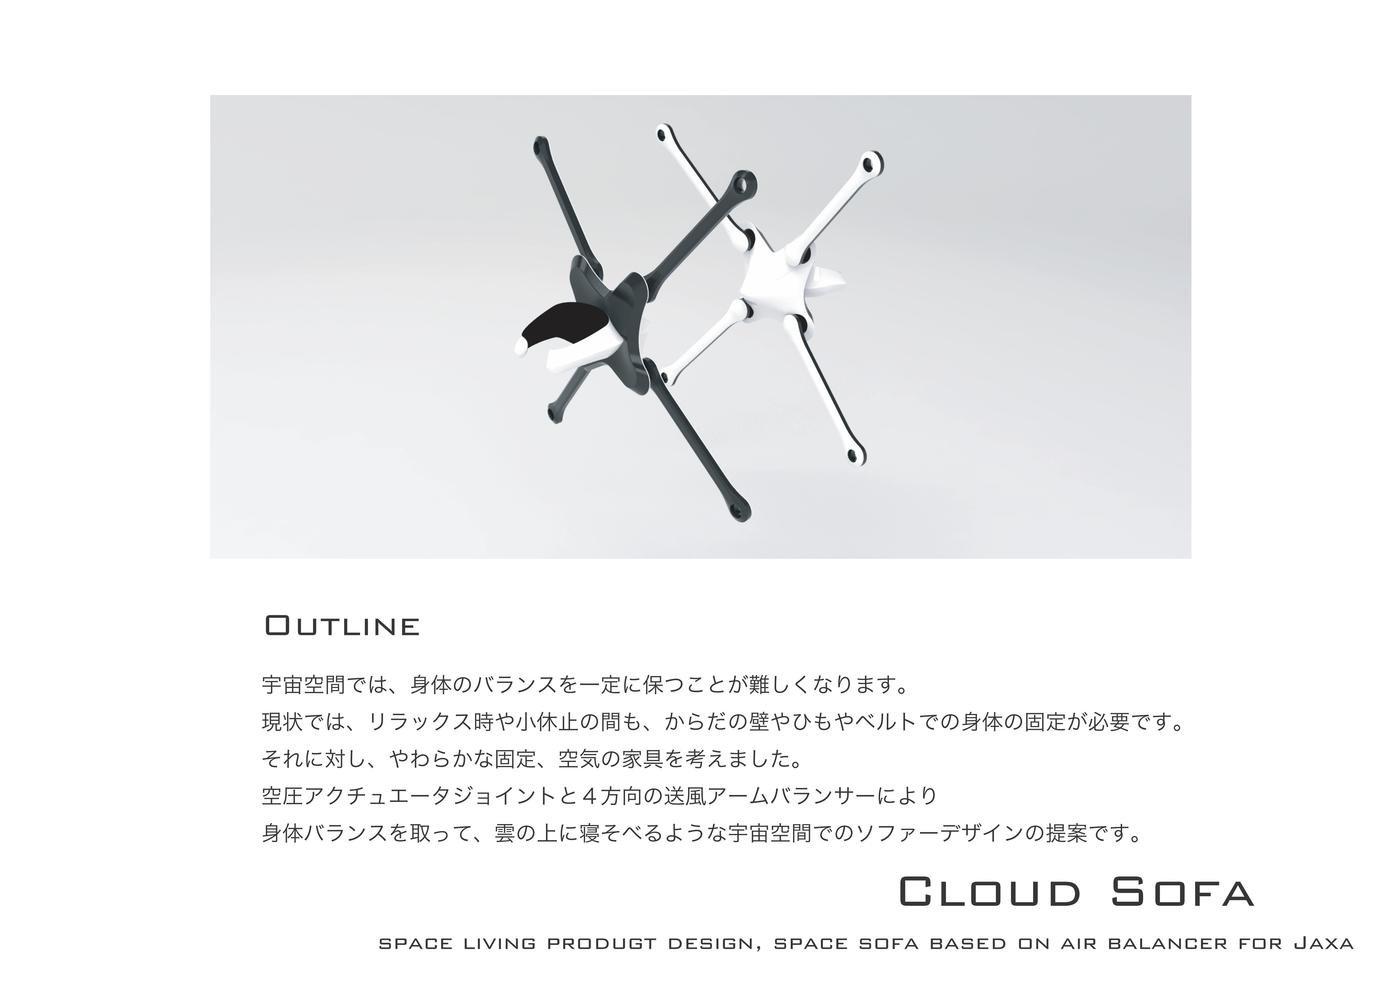 Cloud Sofa イメージ 2